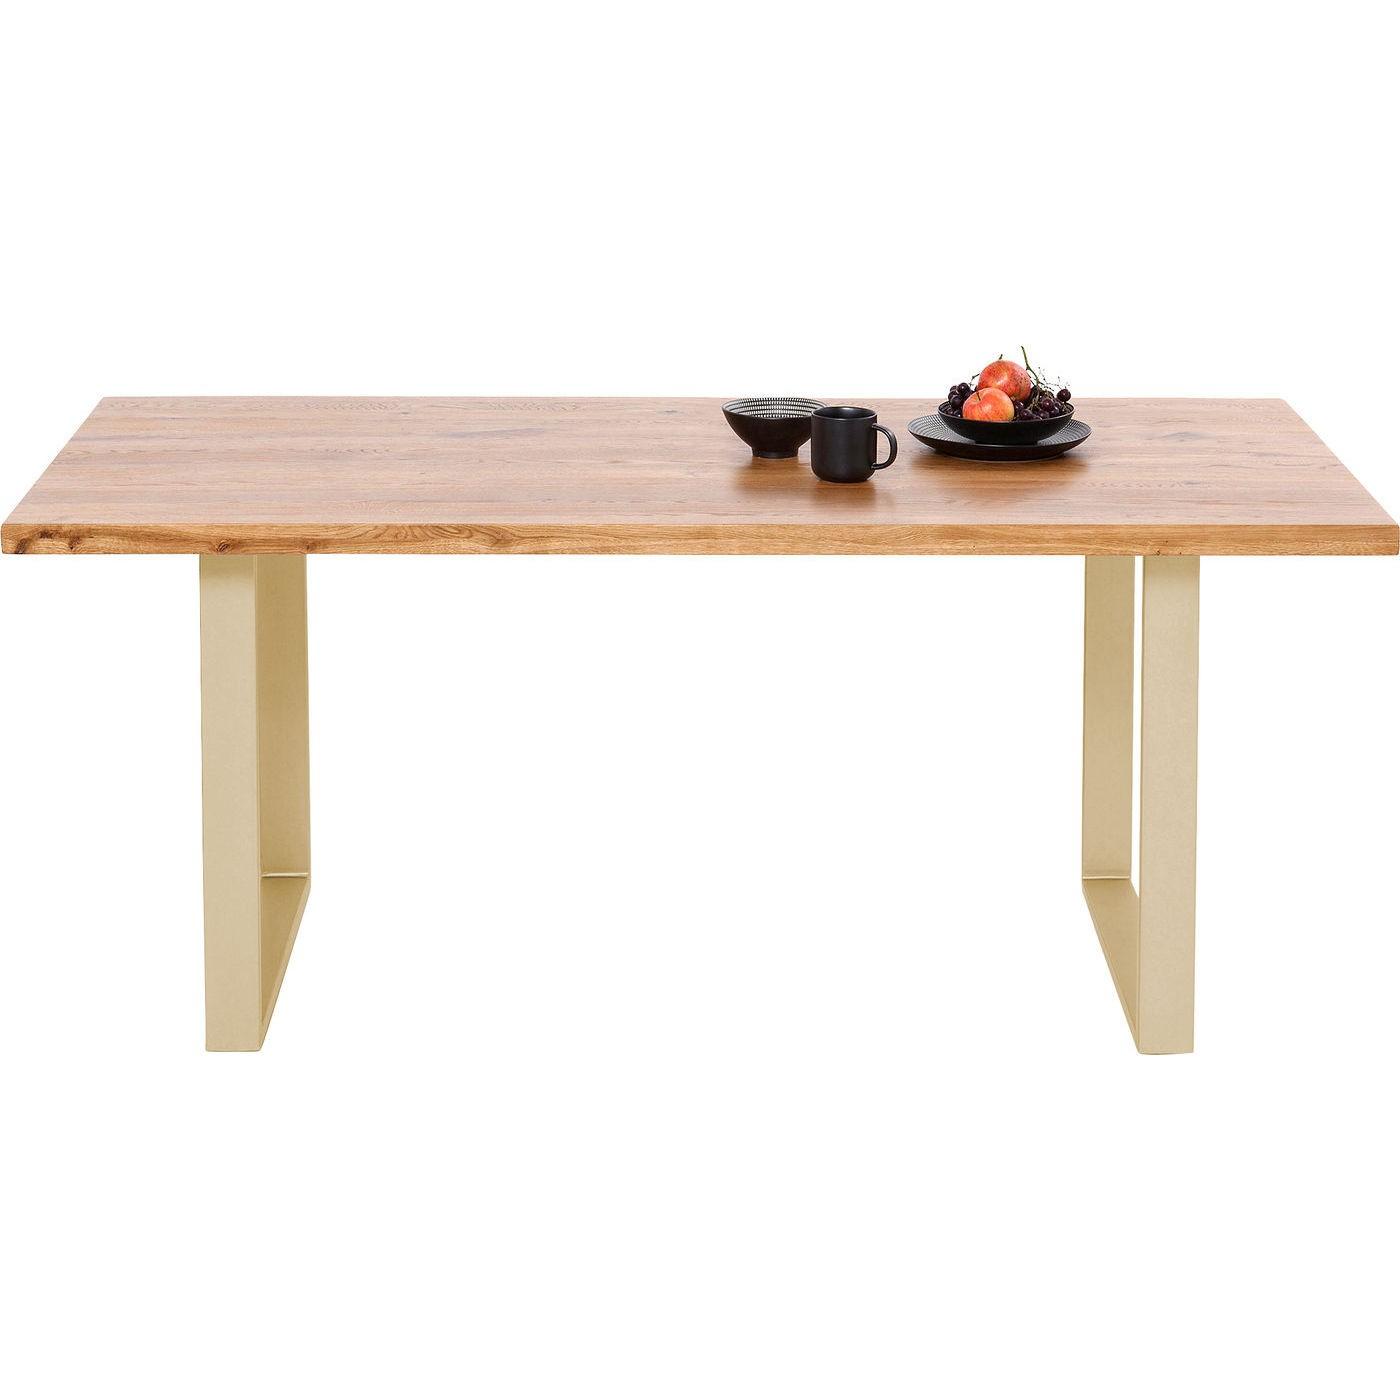 Table Jackie chêne laiton 180x90cm Kare Design